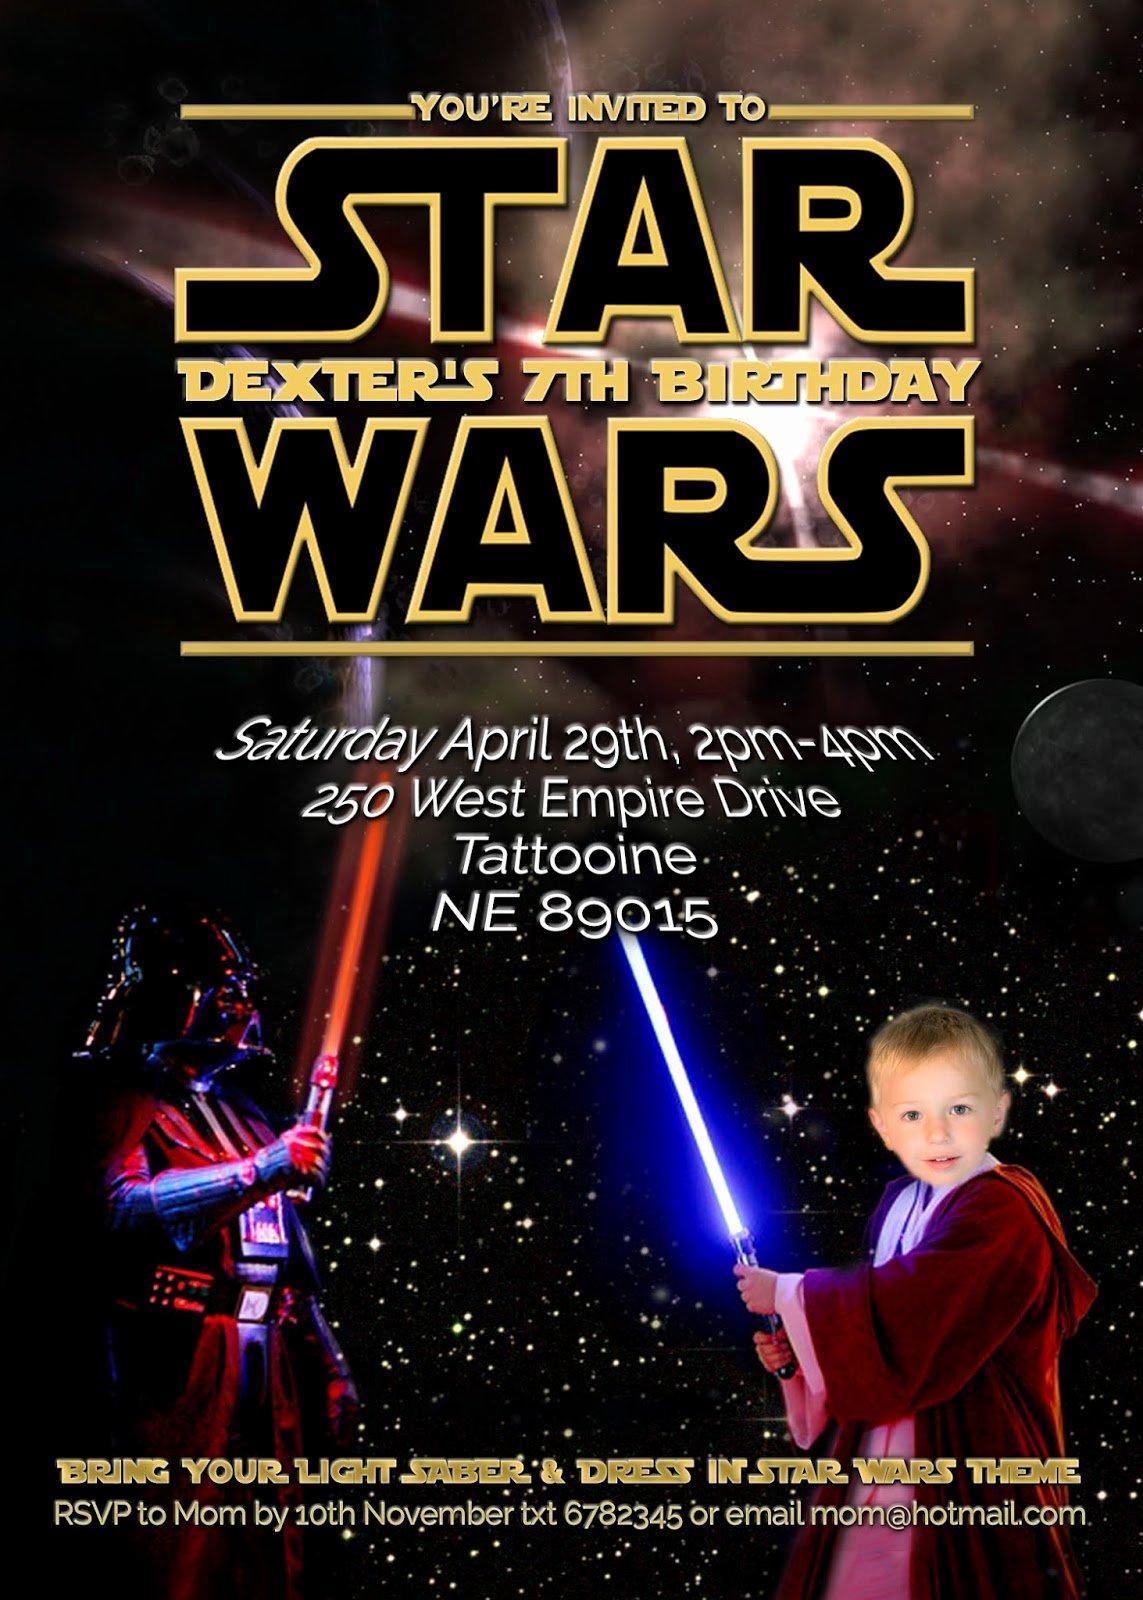 Star Wars Birthday Party Invitations Best Of Free Kids Party Invitations Star Wars Party Invitation Self Edit